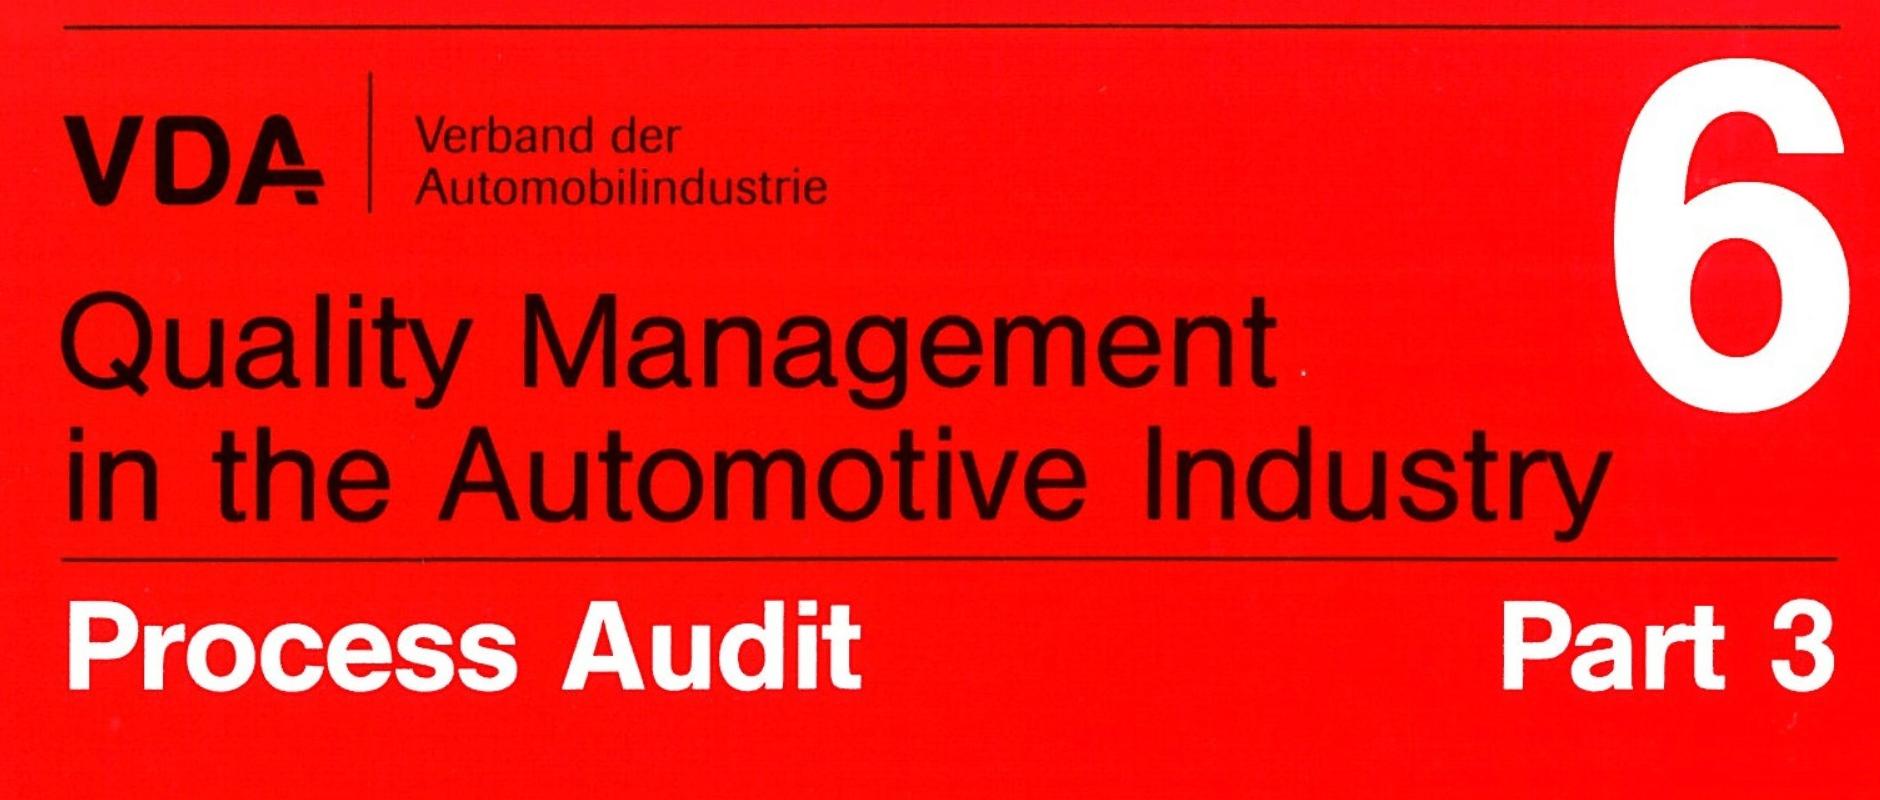 VDA6-3 or VDA 6.3_Scoring_VDA 6.3_Process Audit